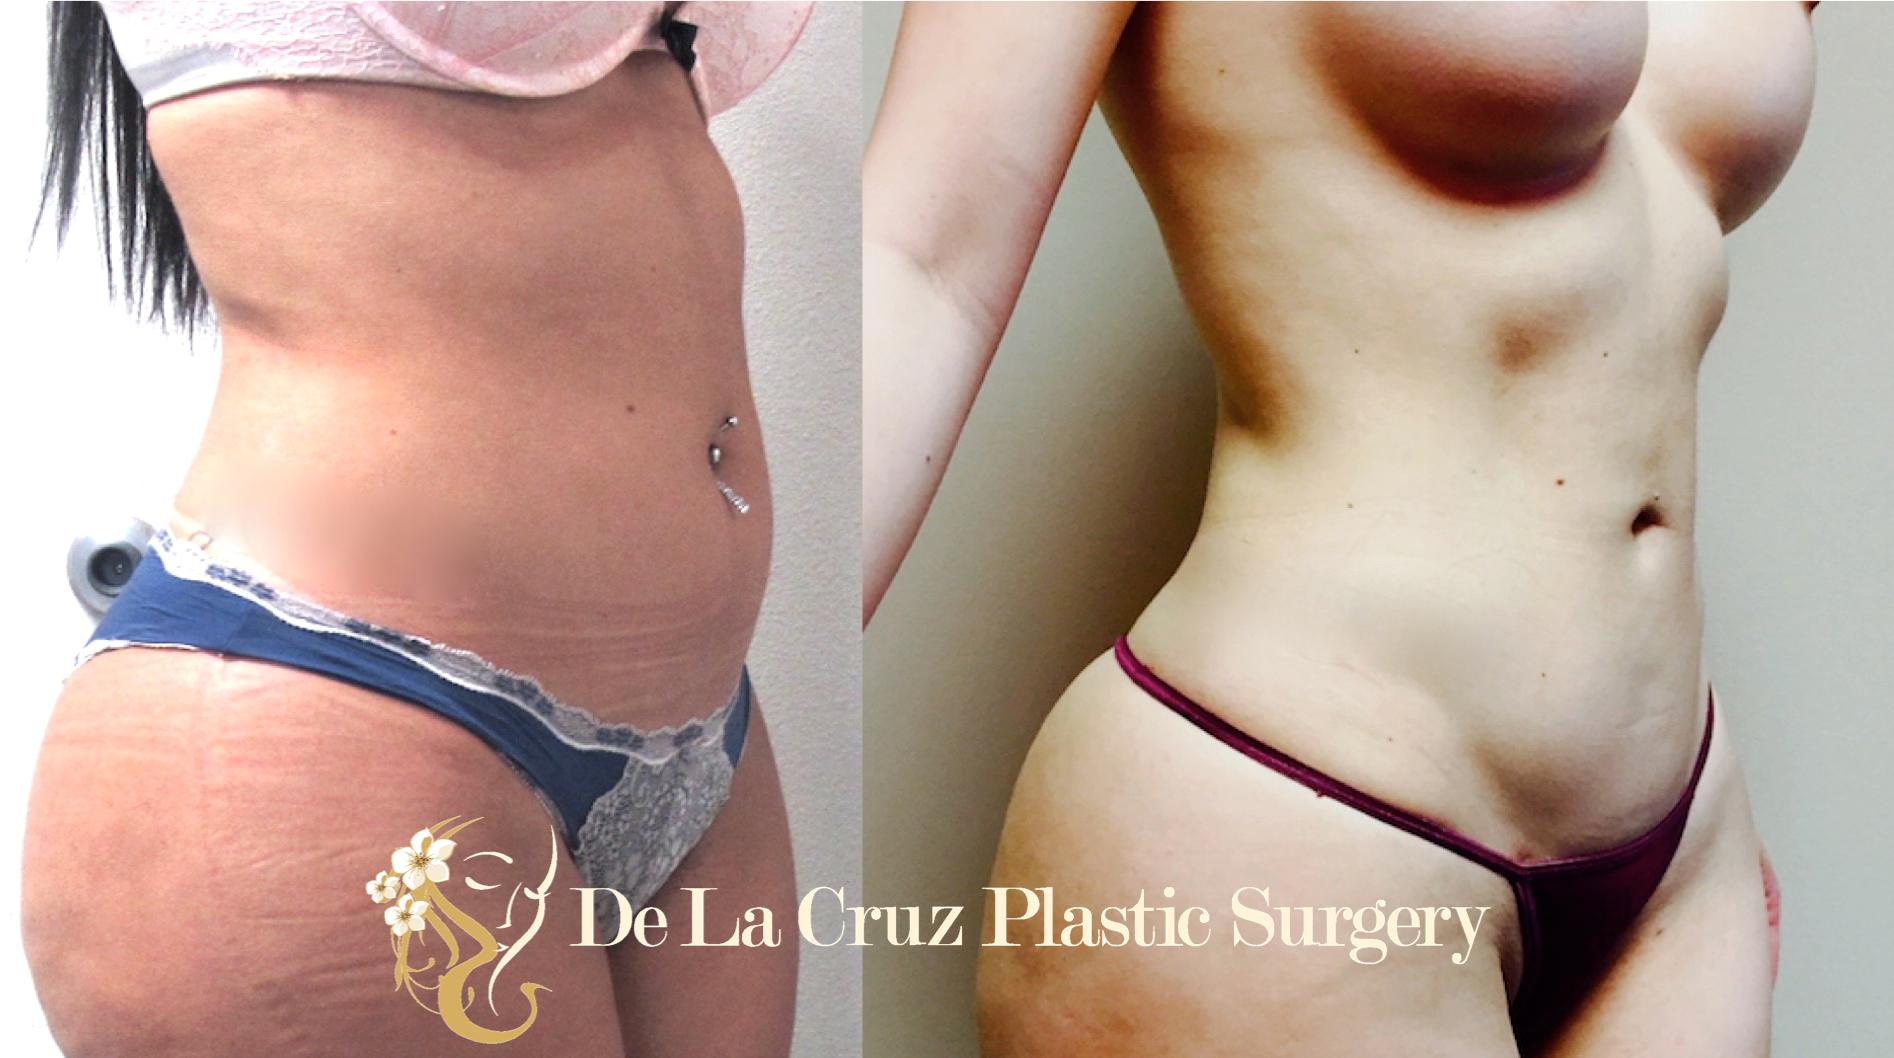 4D VASER Liposuction performed by Dr. Emmanuel De La Cruz of Houston, Texas